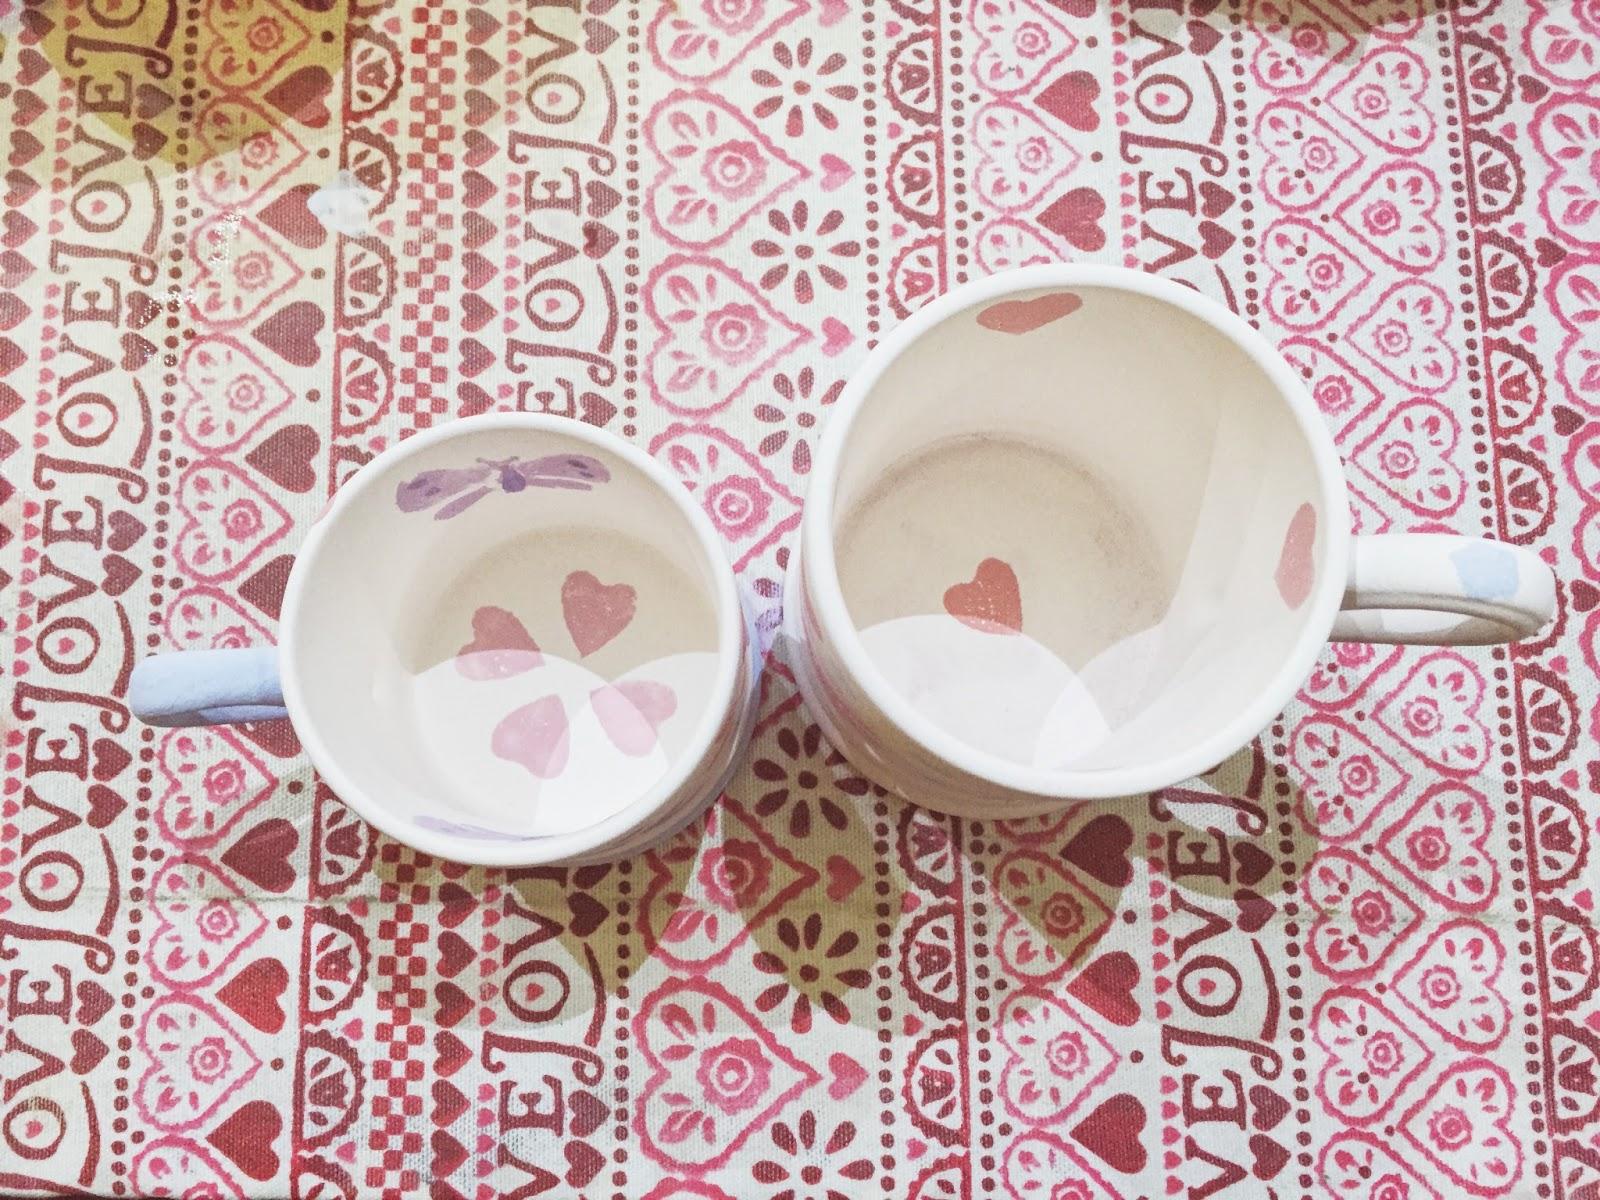 Emma Bridgewater, Decorating Studio, Stoke, Staffordshire Potteries, Potteries, Stoke-On-Trent, Emma Bridgewater Mugs,